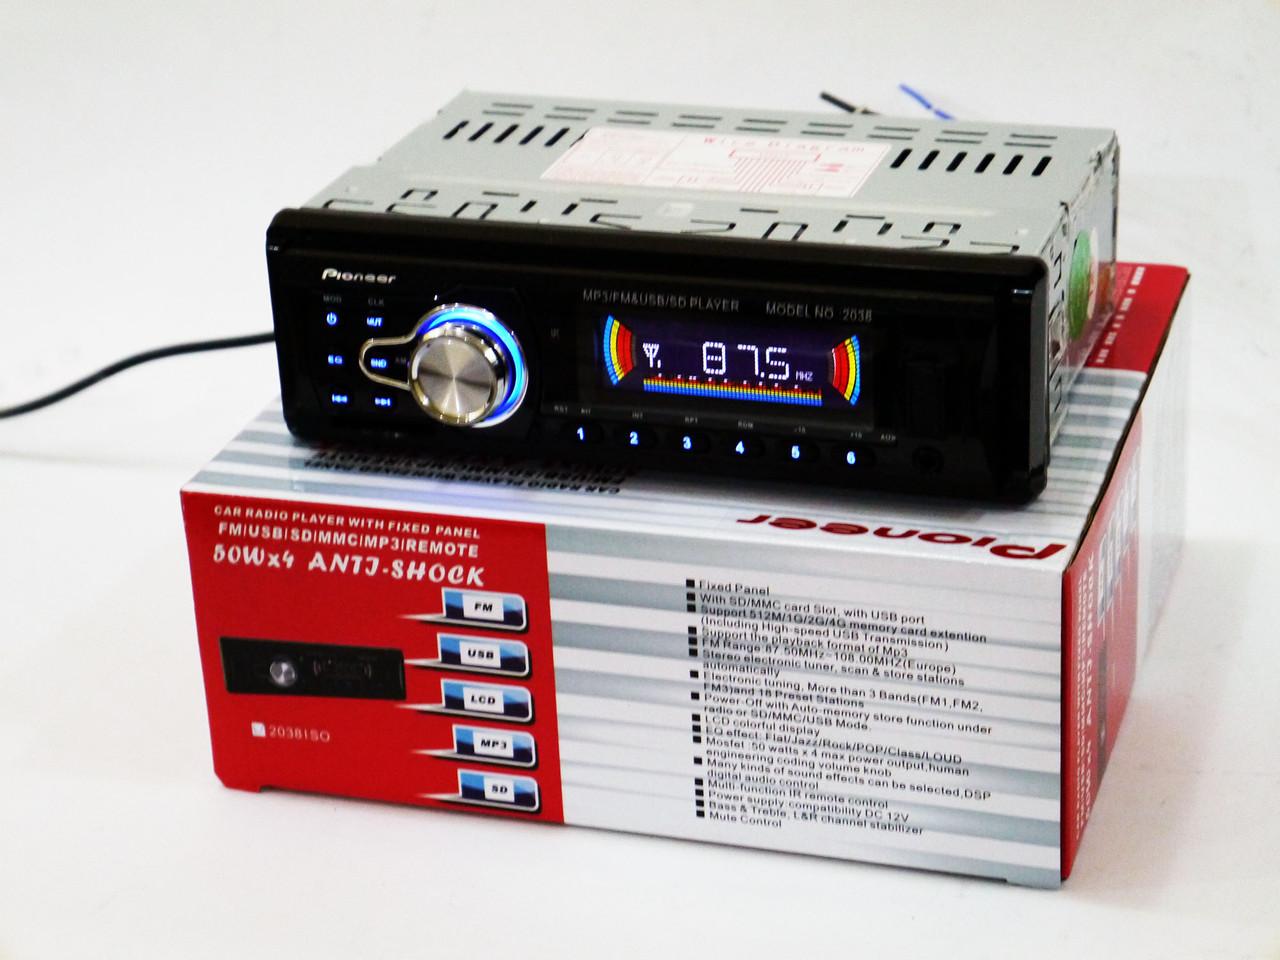 Автомагнитола Pioneer 2038 ISO USB+SD+FM+AUX+ пульт (4x50W), фото 1